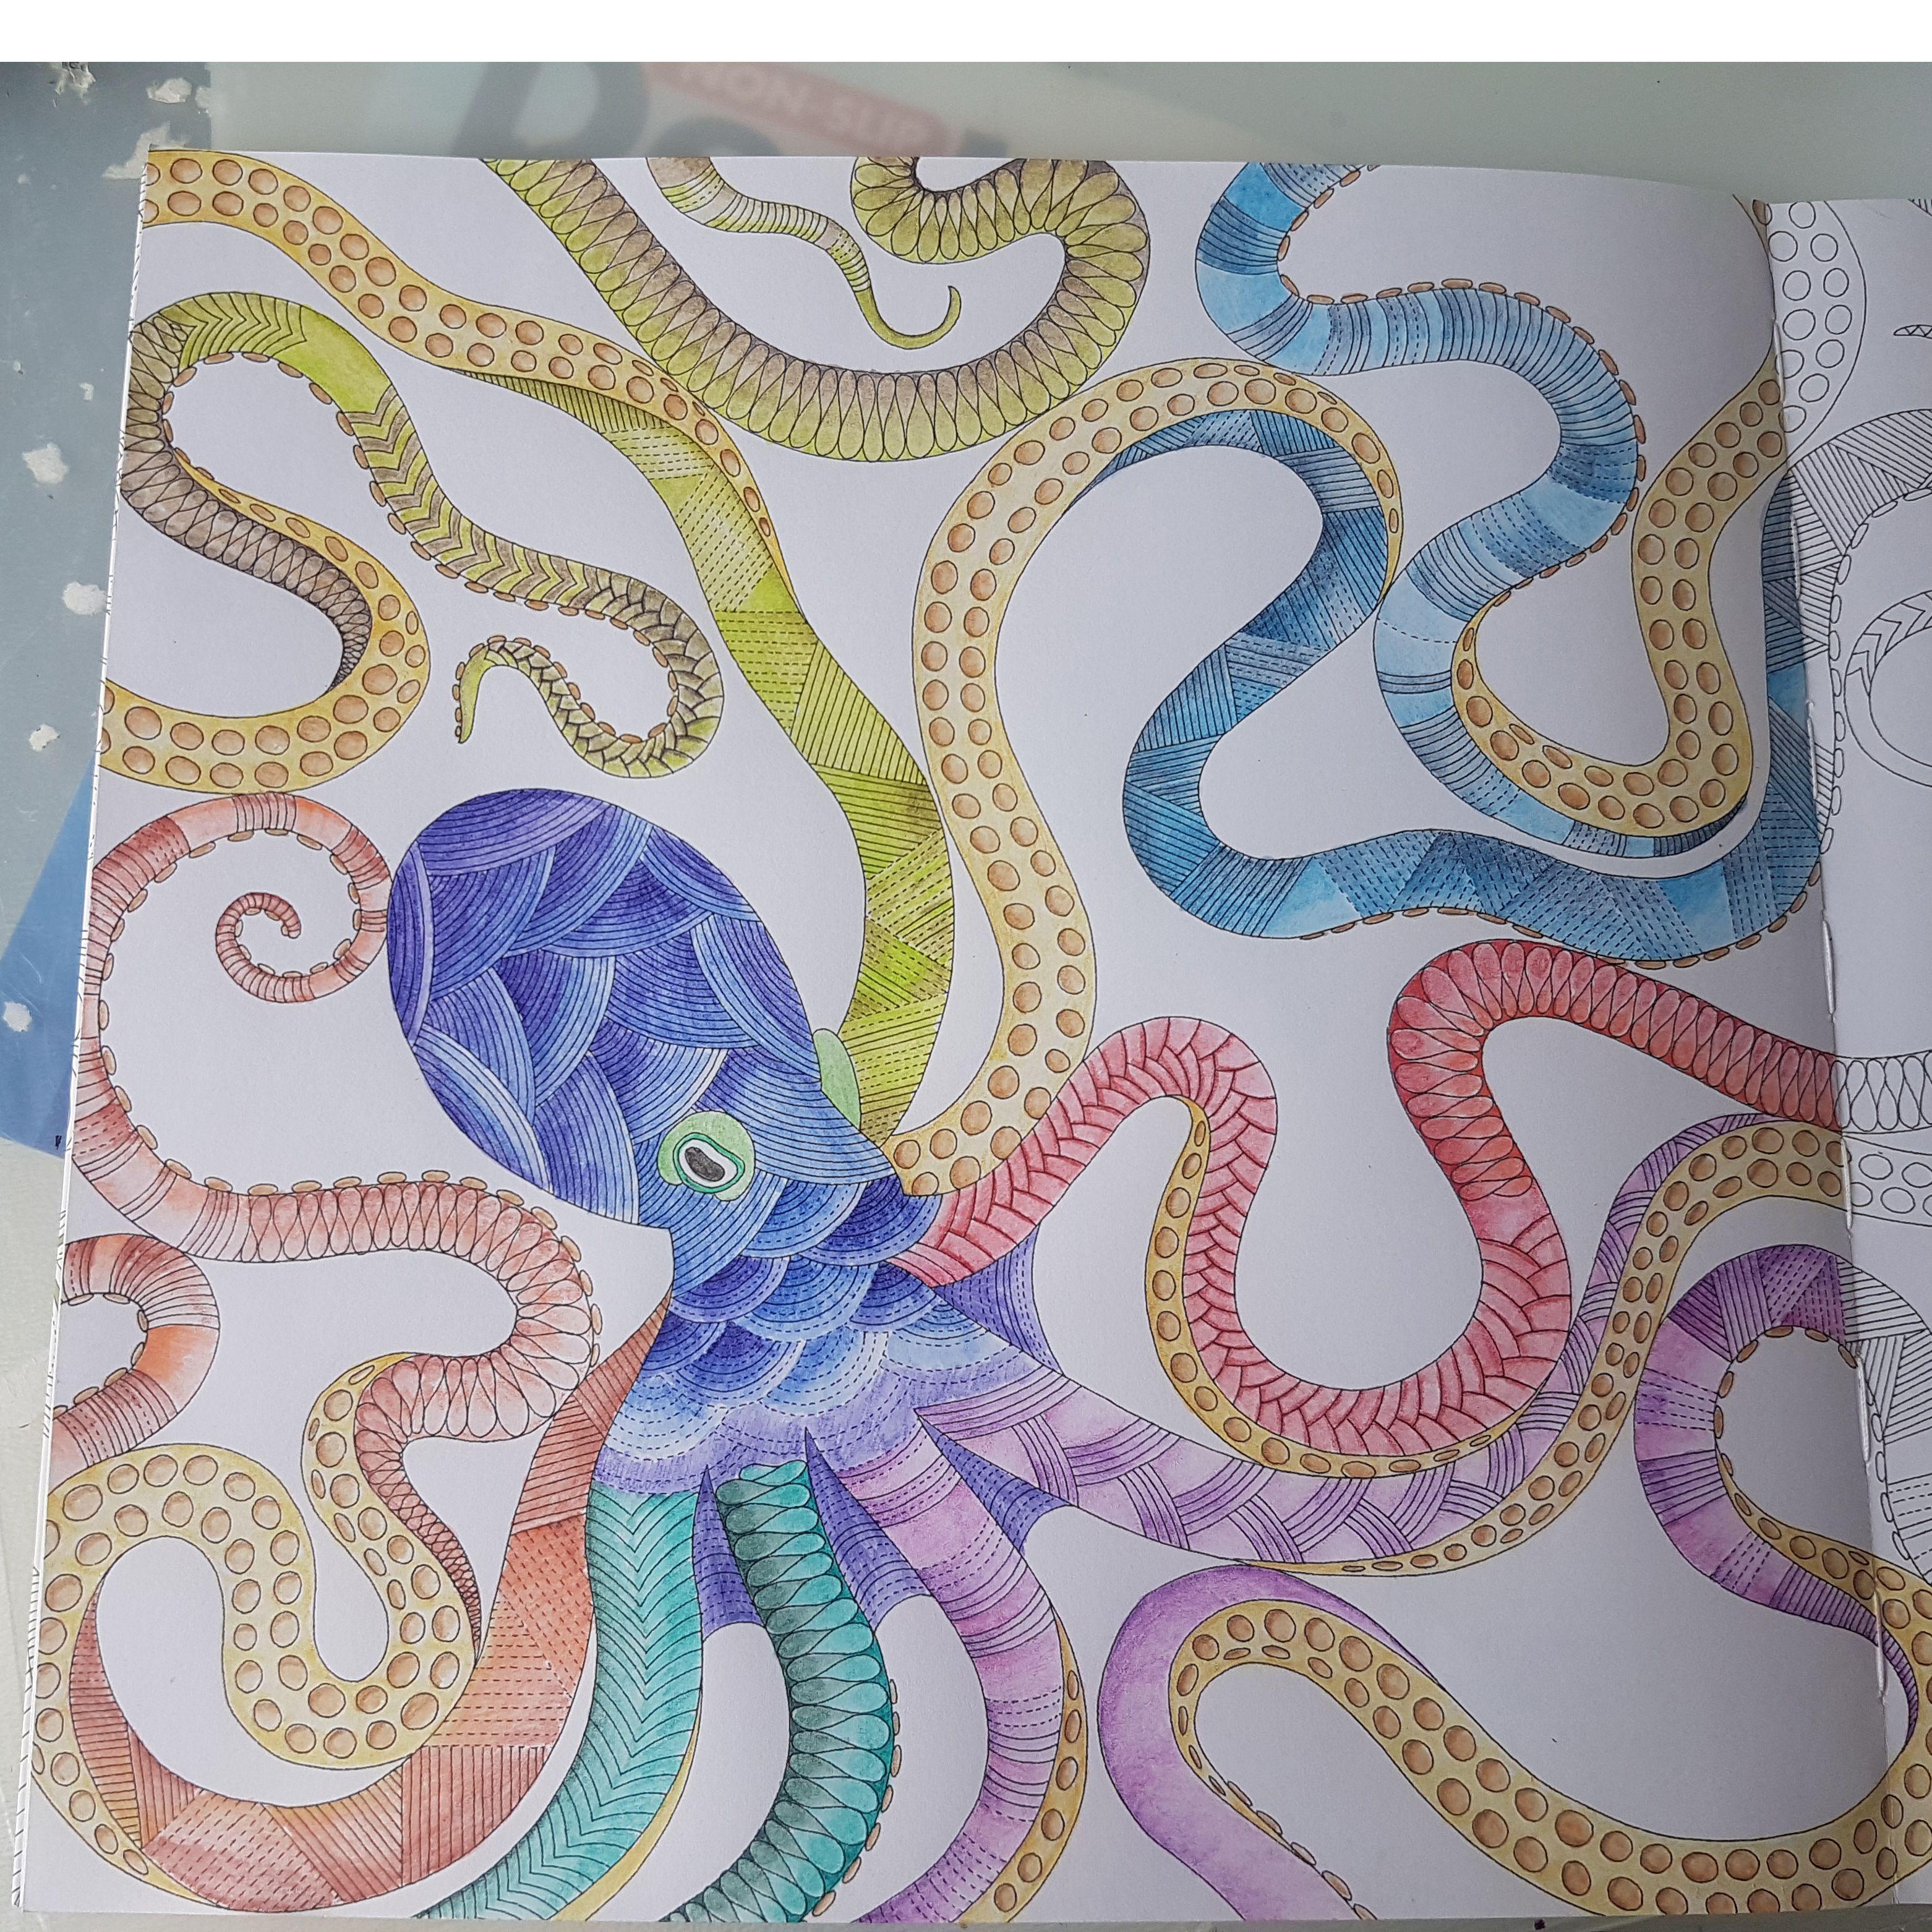 Octopus From Millie Marotta Animal Kingdom Testing Out Derwent Inktense